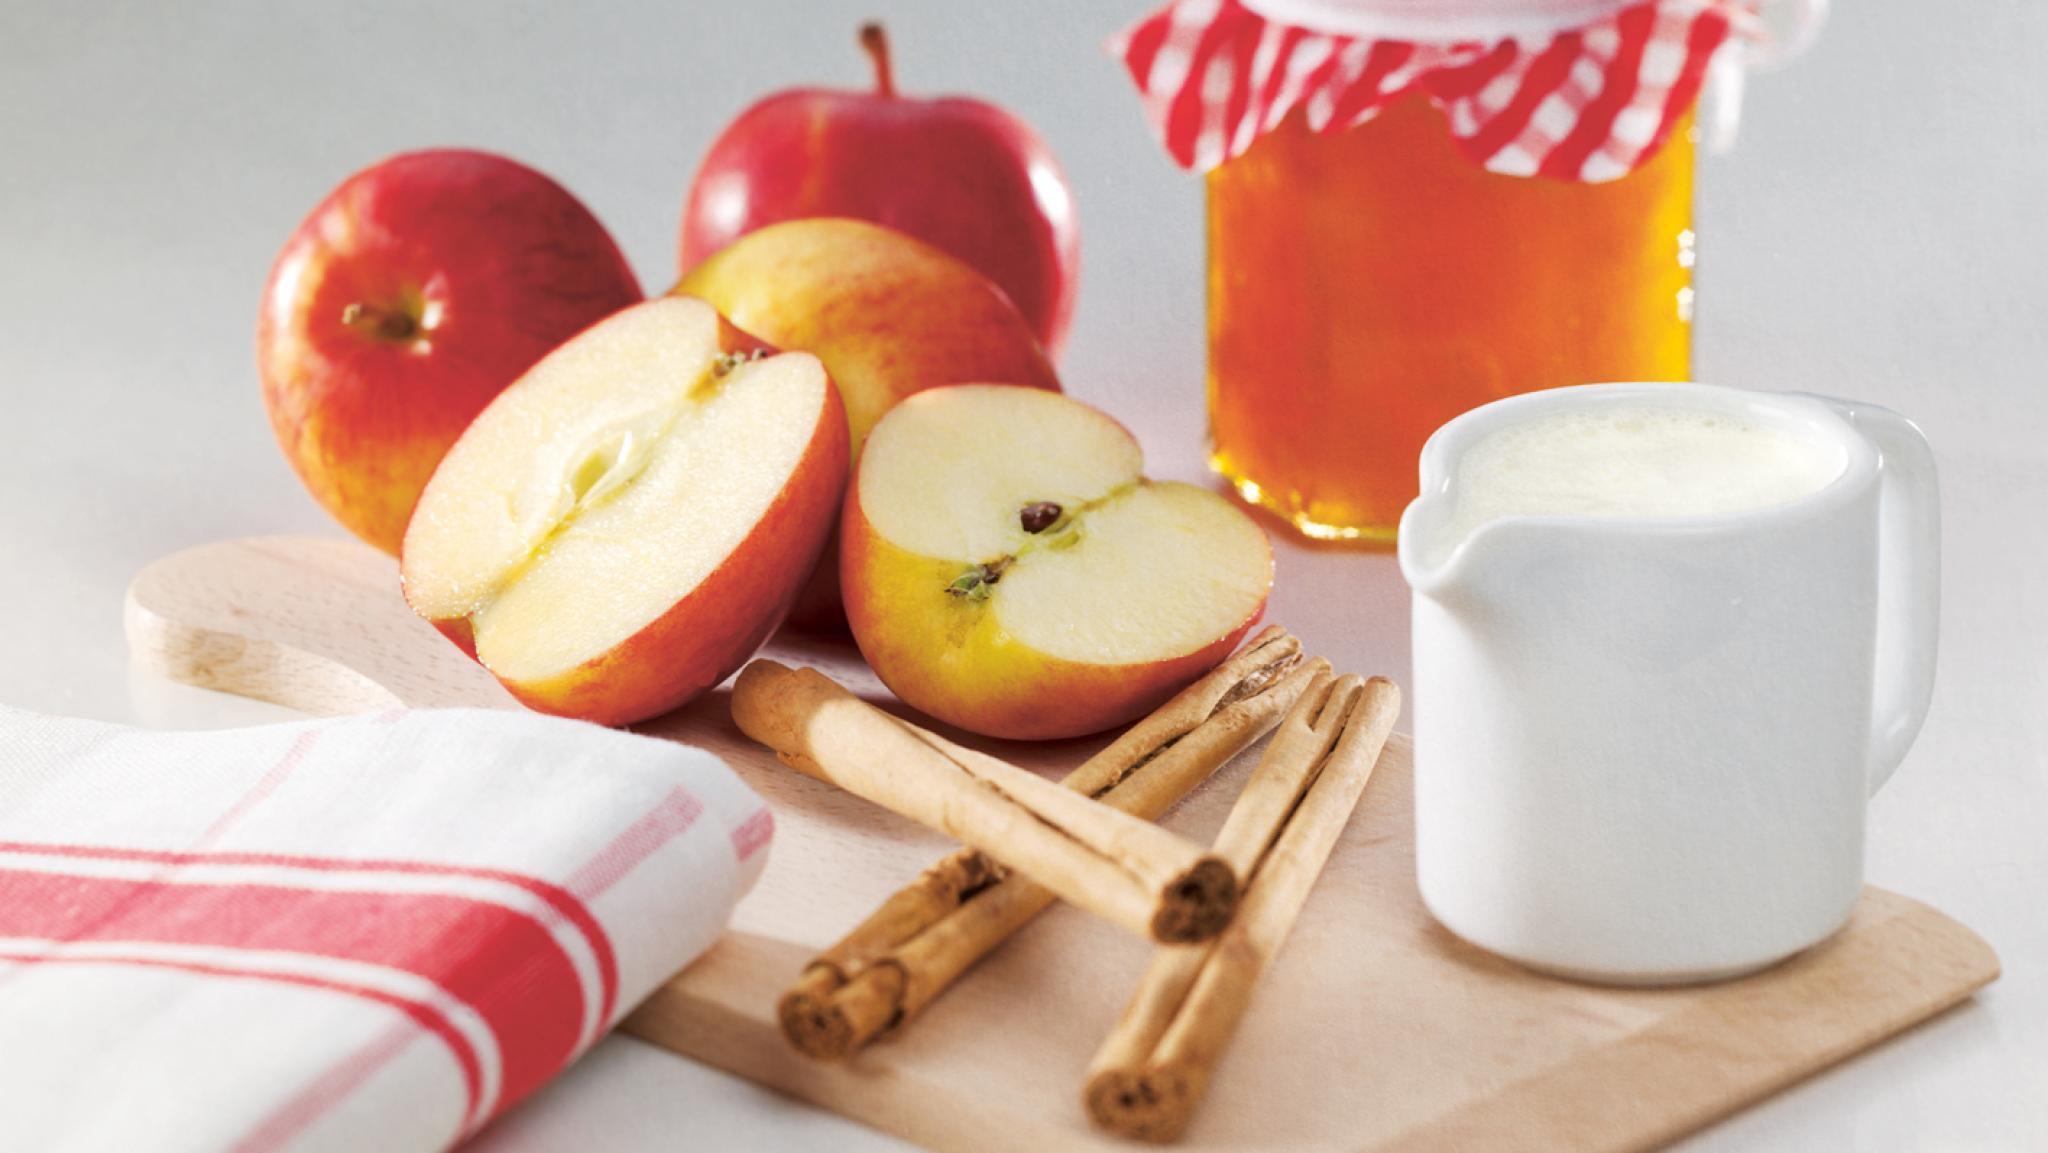 Zürcher Apfel-Zimt-Chüechli